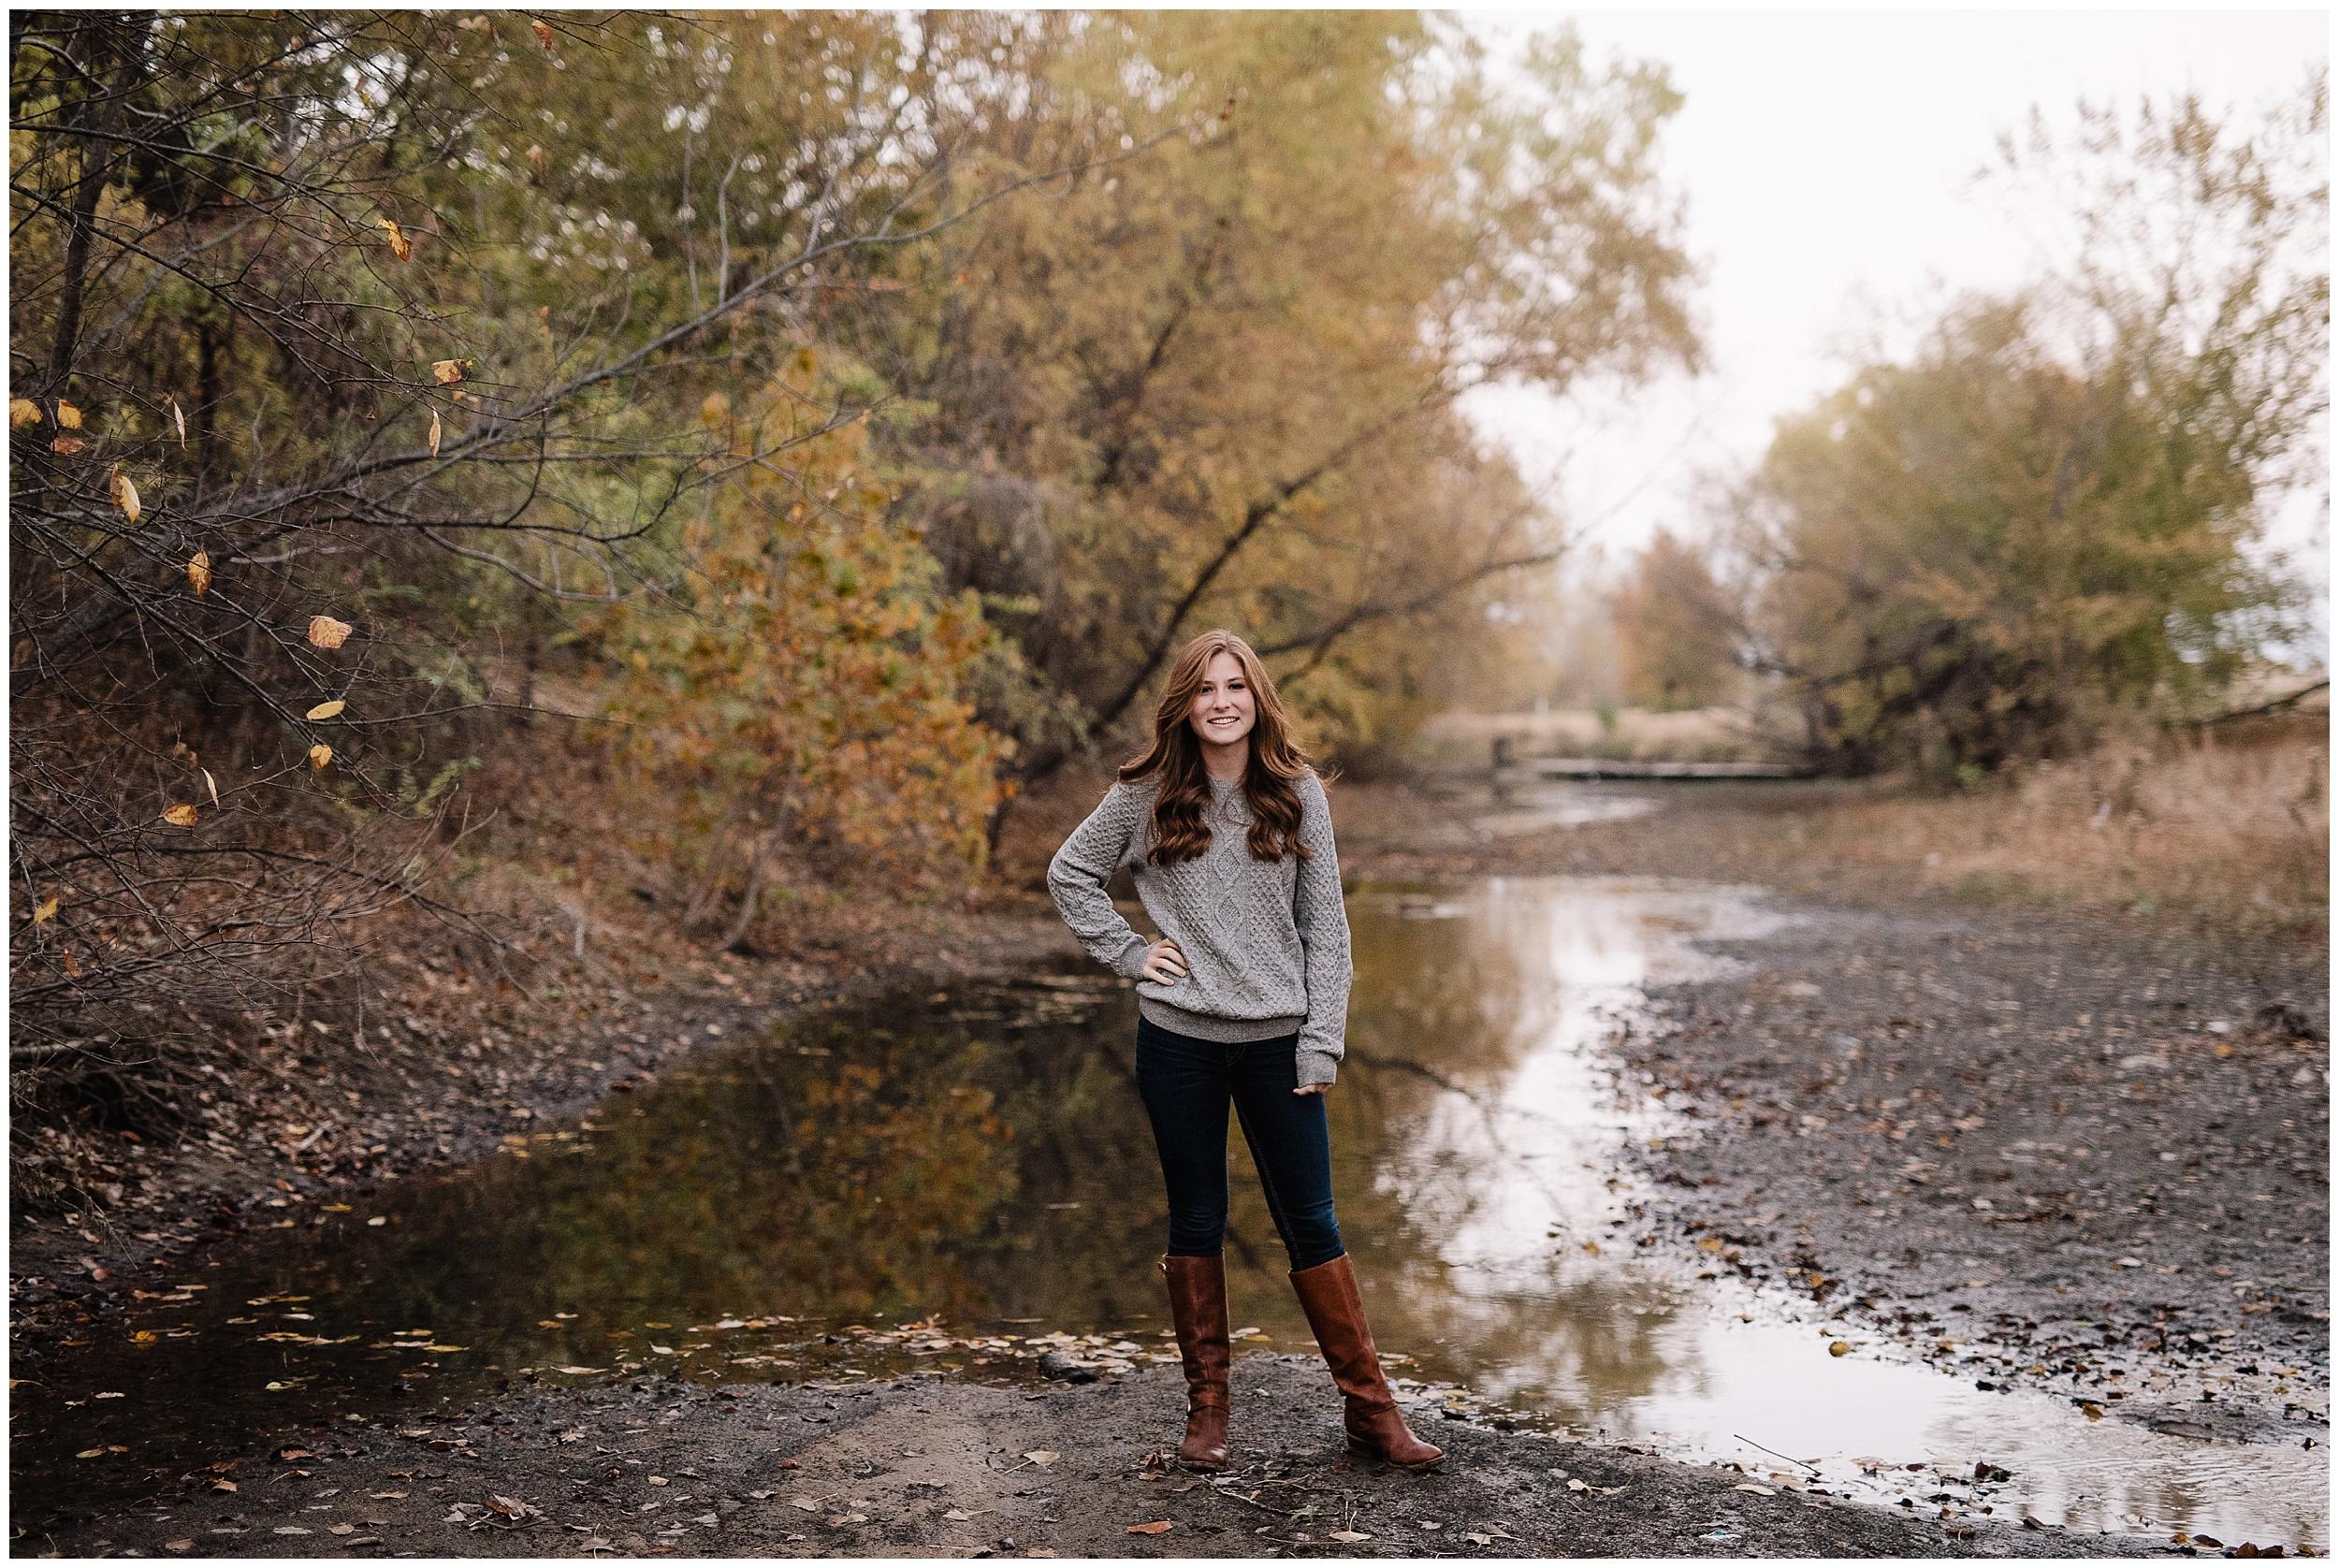 oklahoma wedding photographer portrait senior high school outdoor beautiful nature wichita kansas river stream water